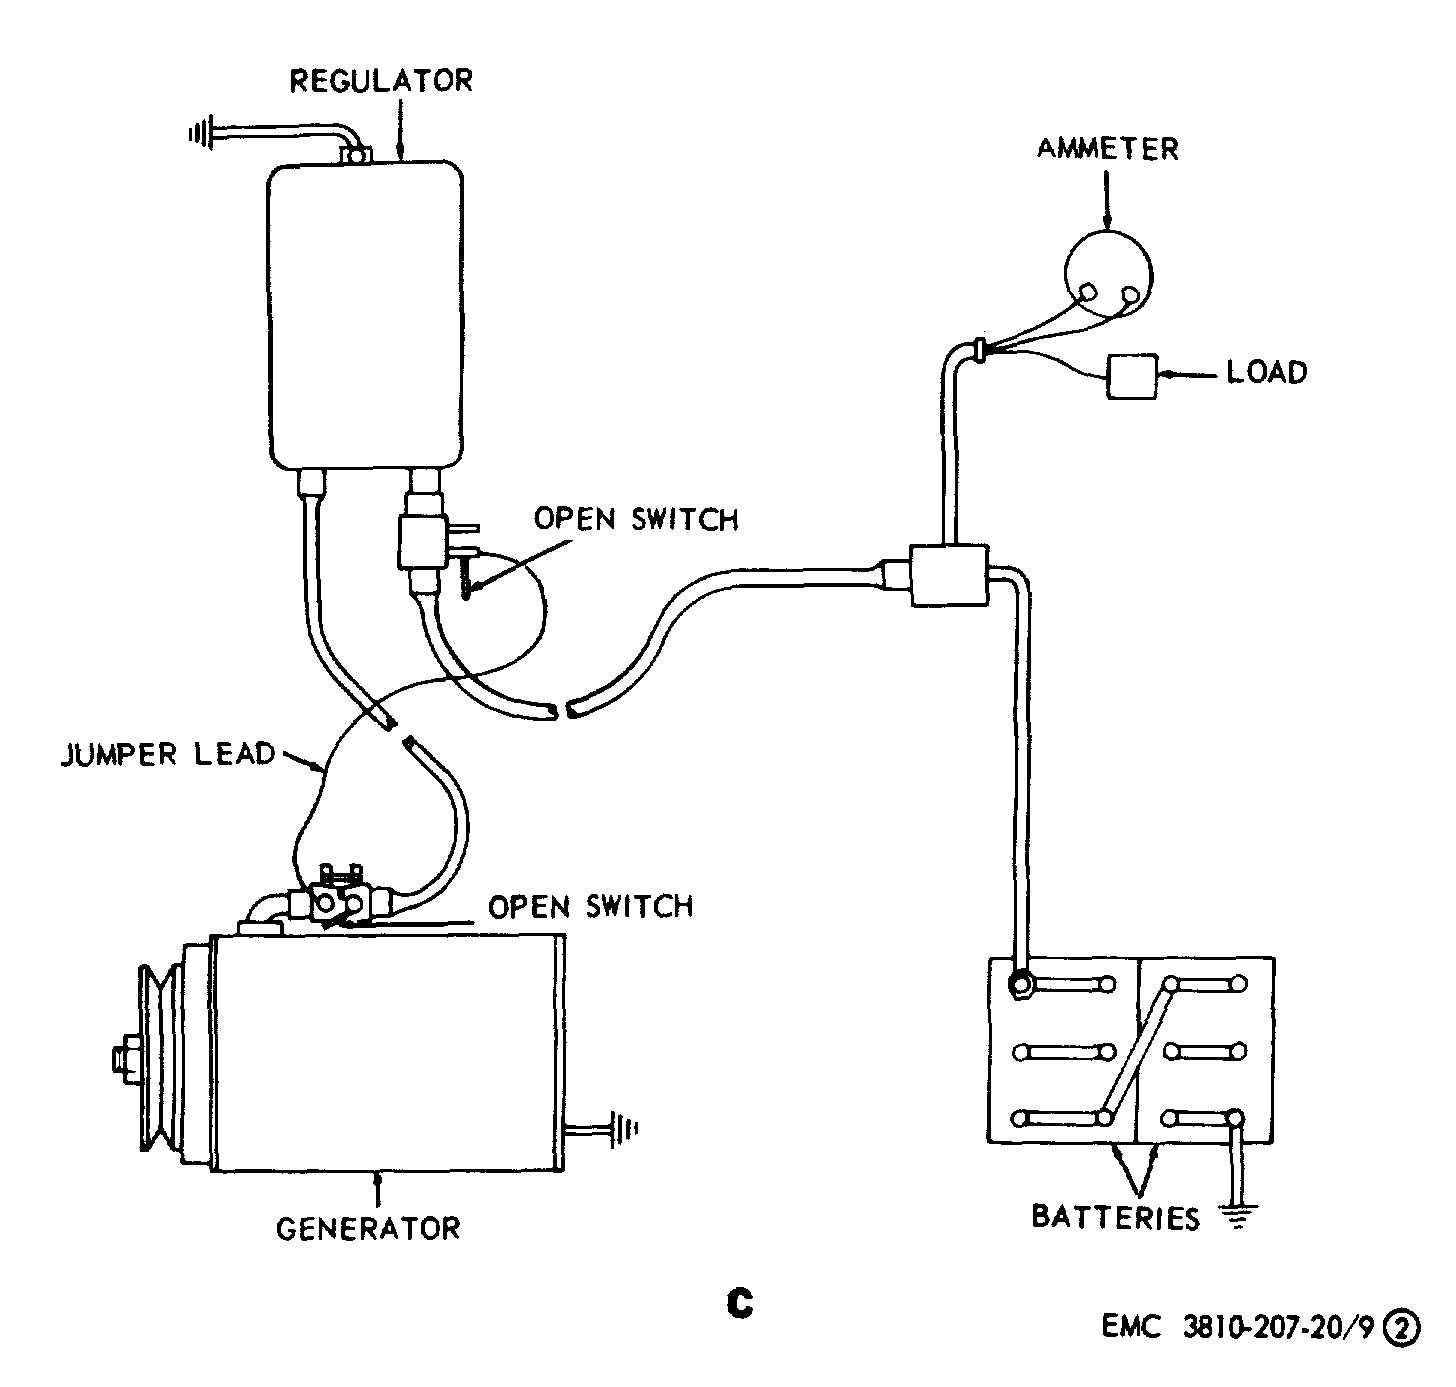 Admirable Electric Generator Wiring Diagram Wiring Diagram Wiring Cloud Ymoonsalvmohammedshrineorg